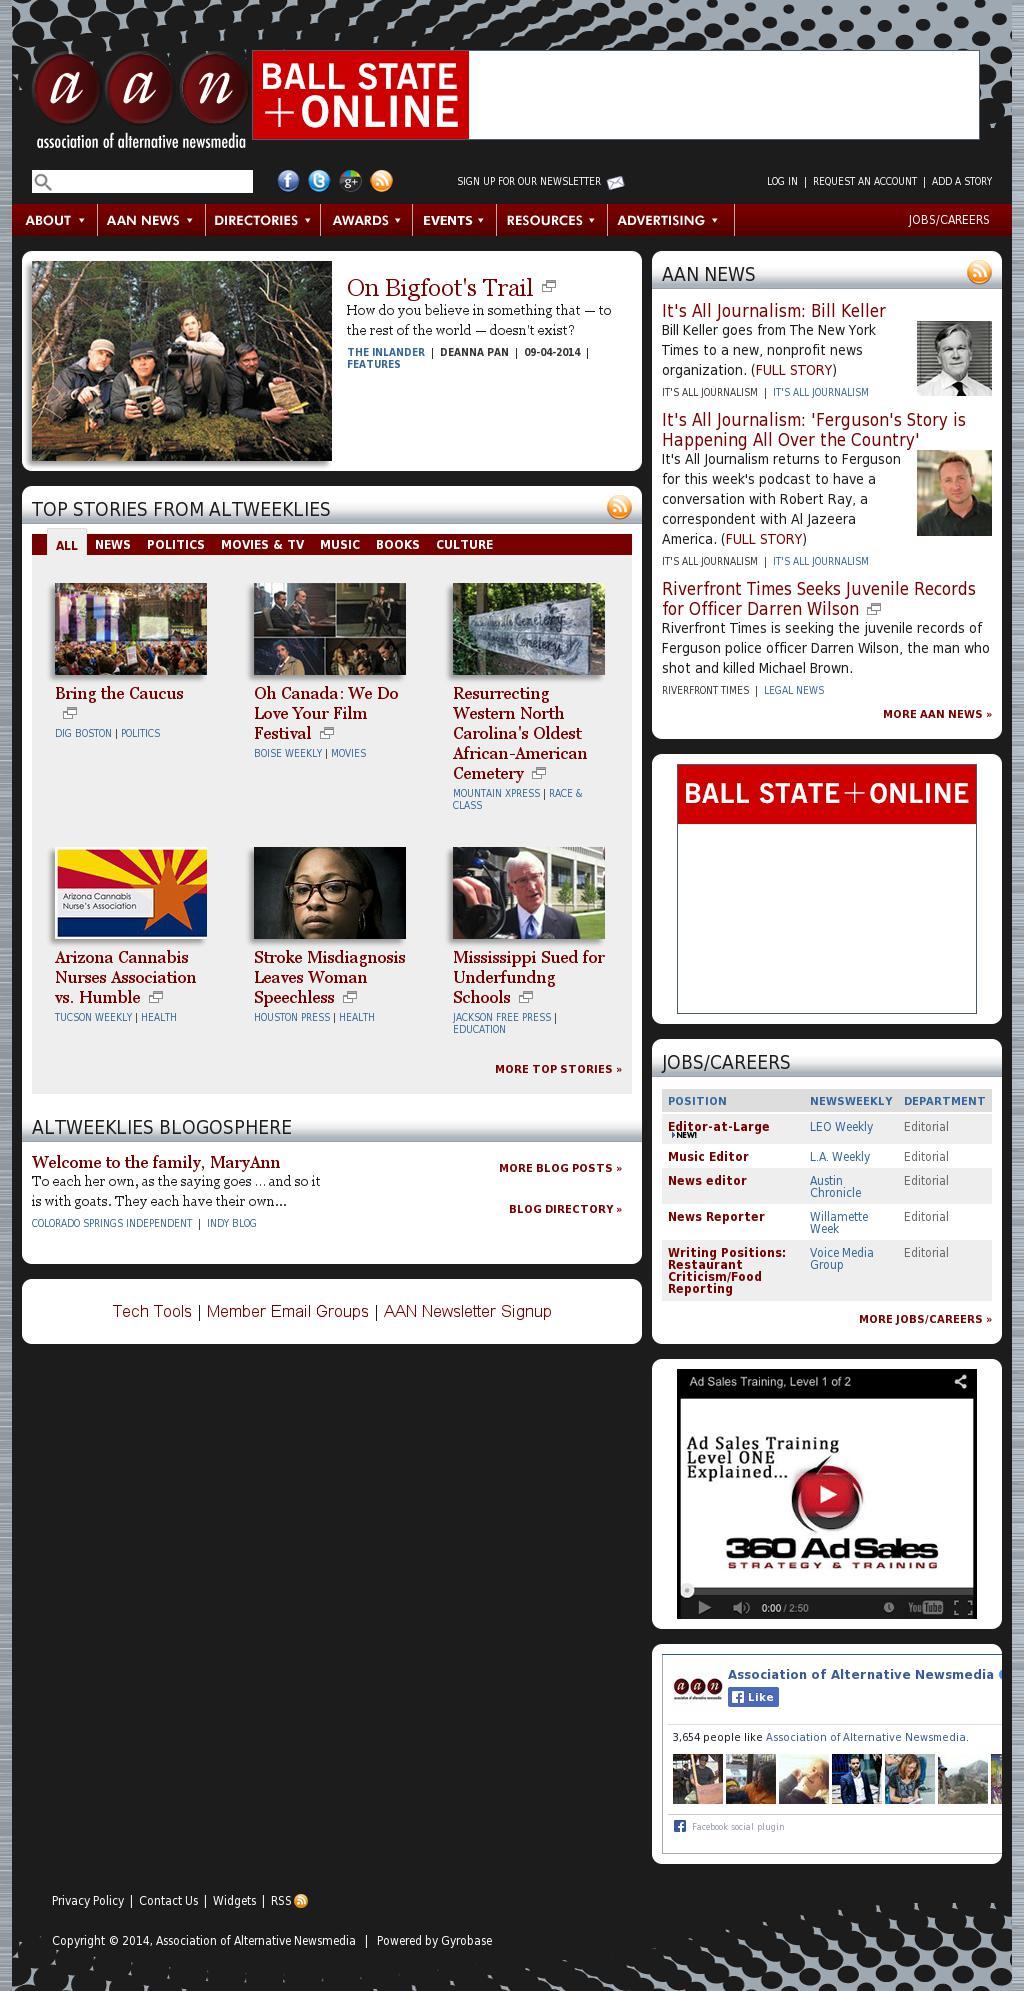 Association of Alternative Newsmedia at Monday Sept. 8, 2014, 5 a.m. UTC